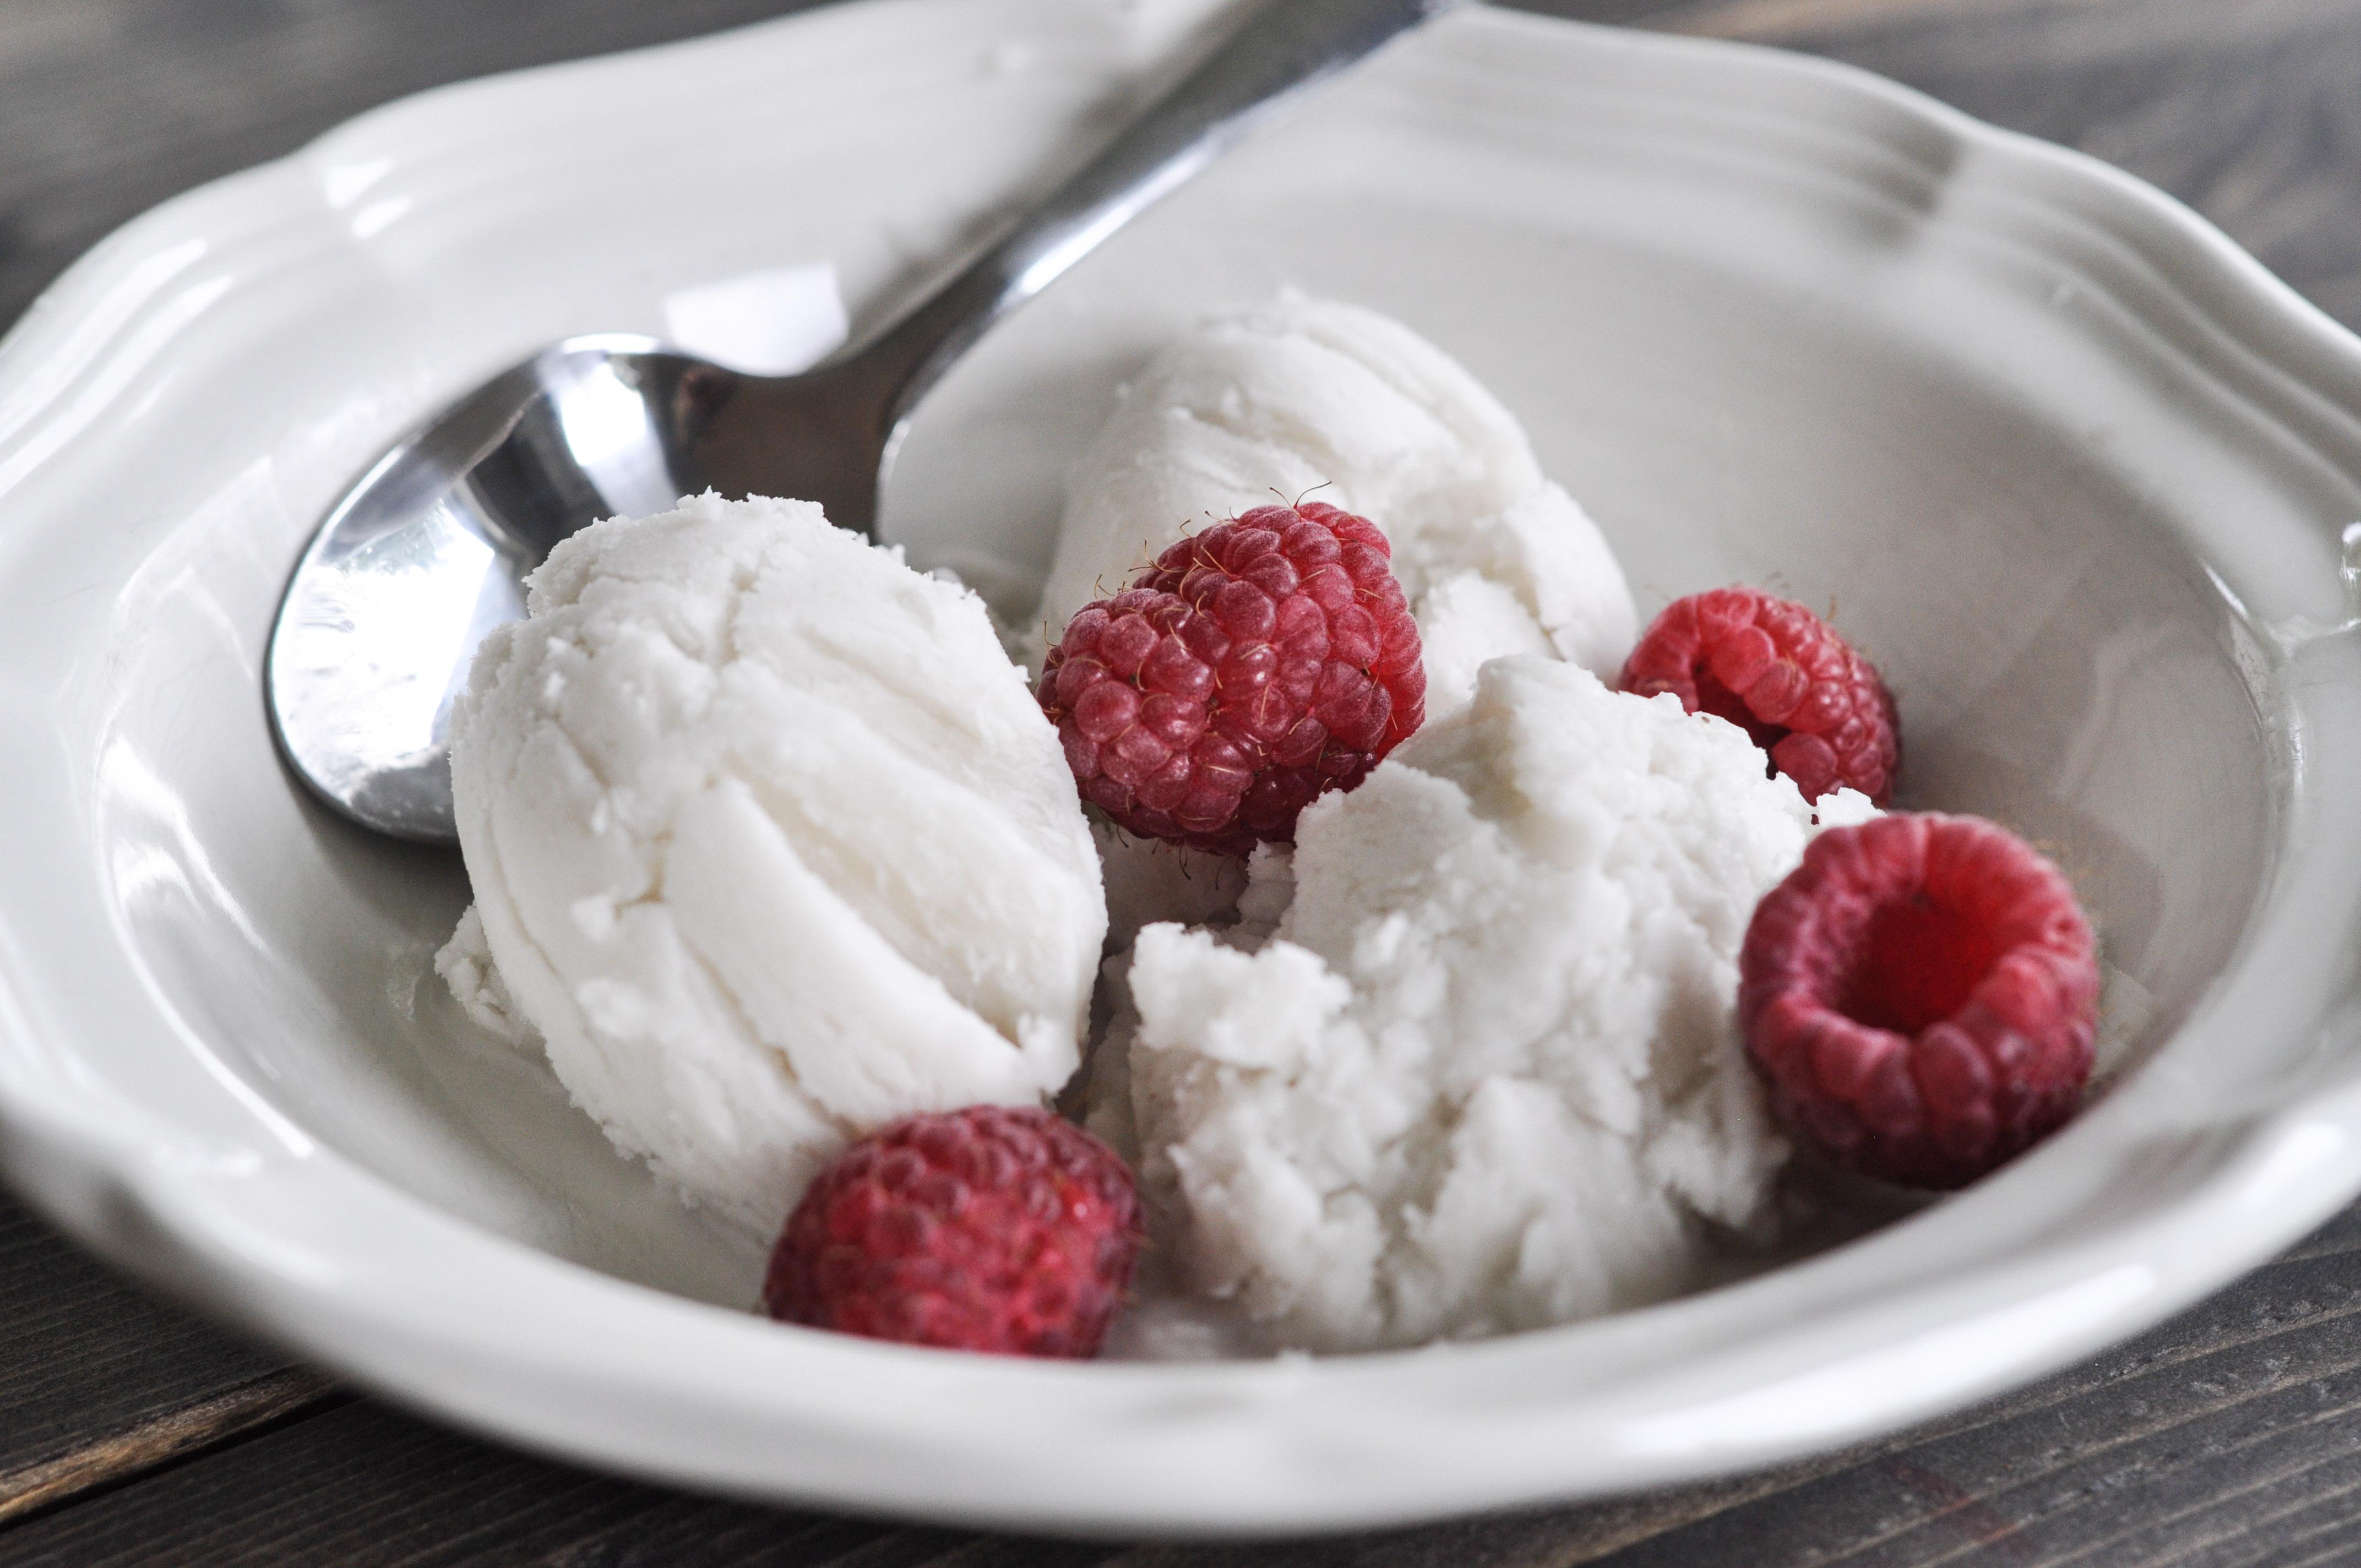 Food Processor Ice Cream With Milk